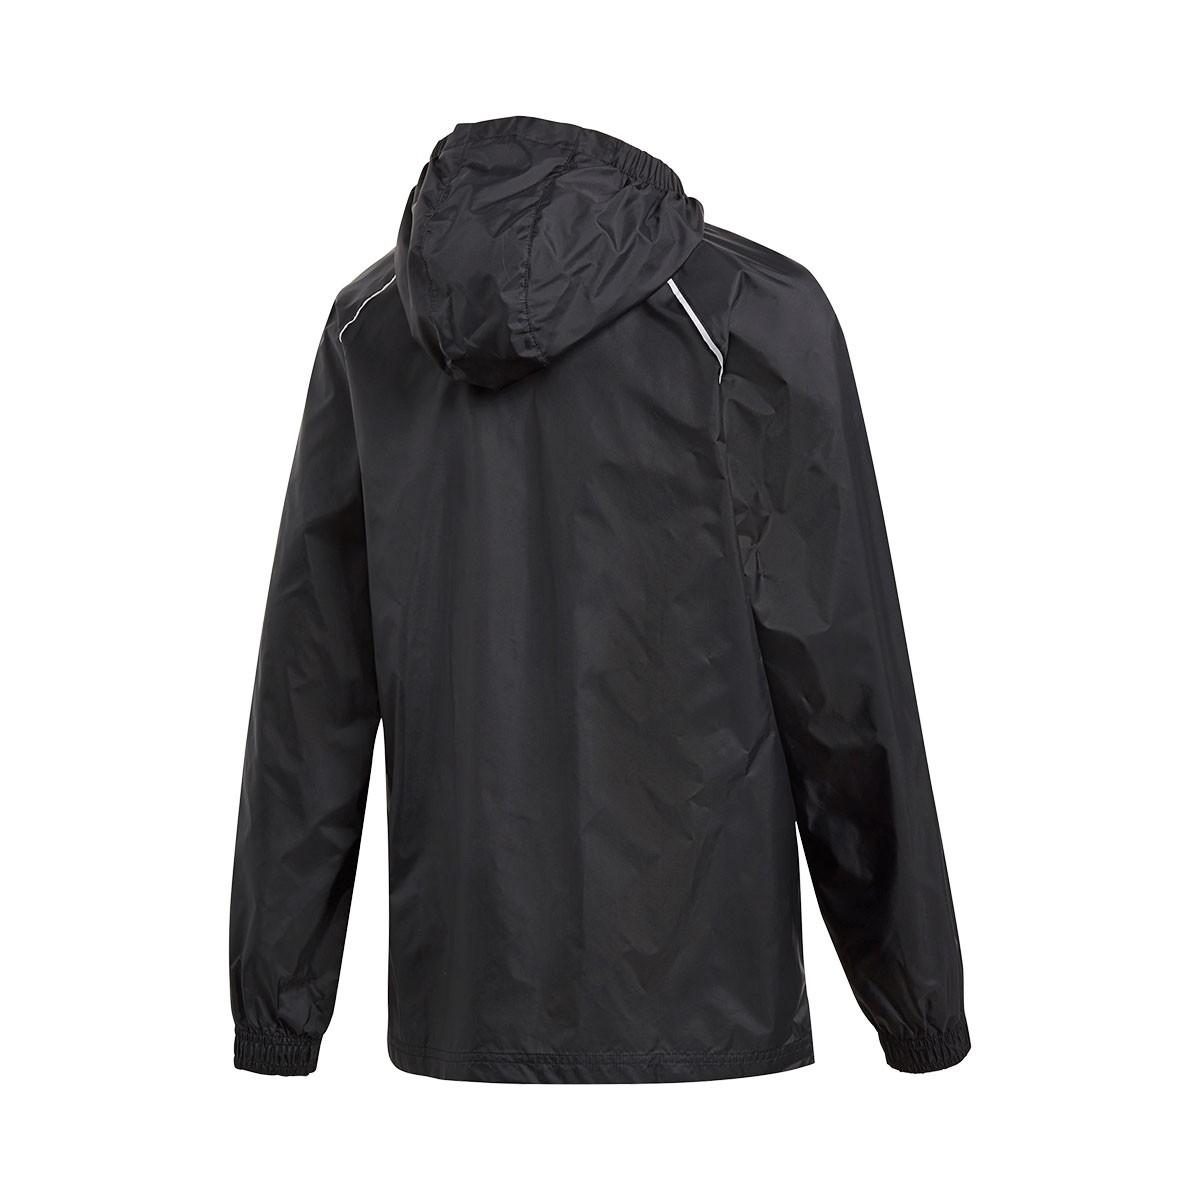 b6ab4ef19 Chubasquero adidas Core 18 Niño Black-White - Tienda de fútbol Fútbol  Emotion